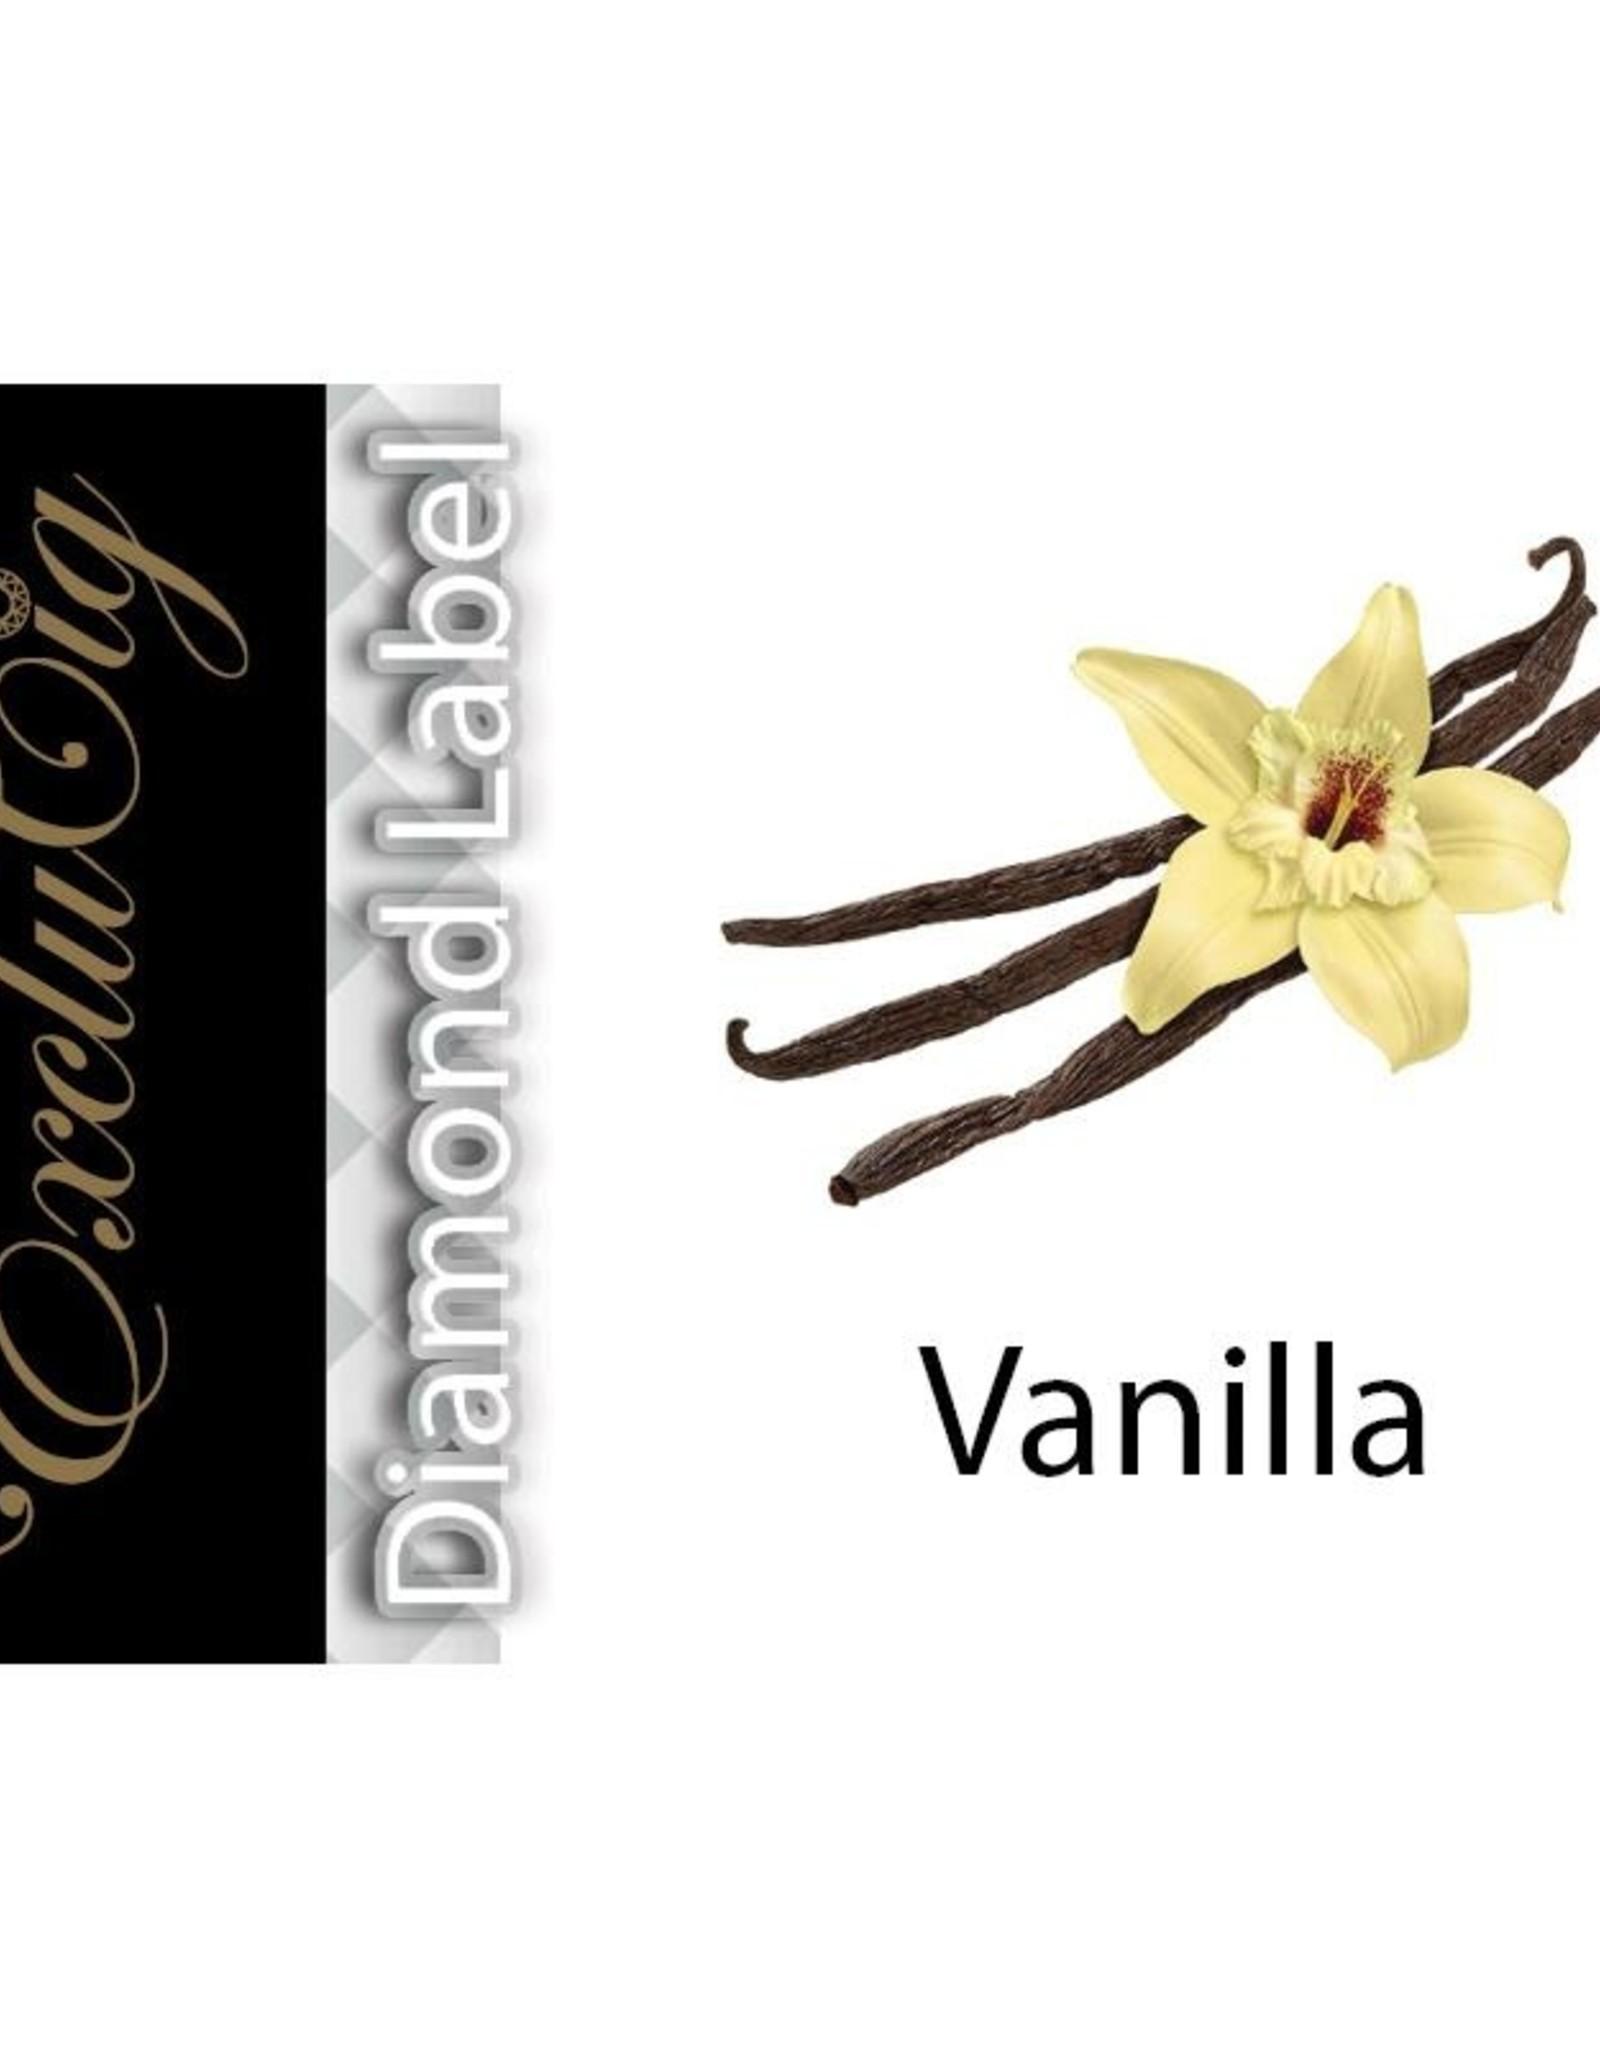 Exclucig Exclucig Diamond Label E-liquid Vanilla 6 mg Nicotine